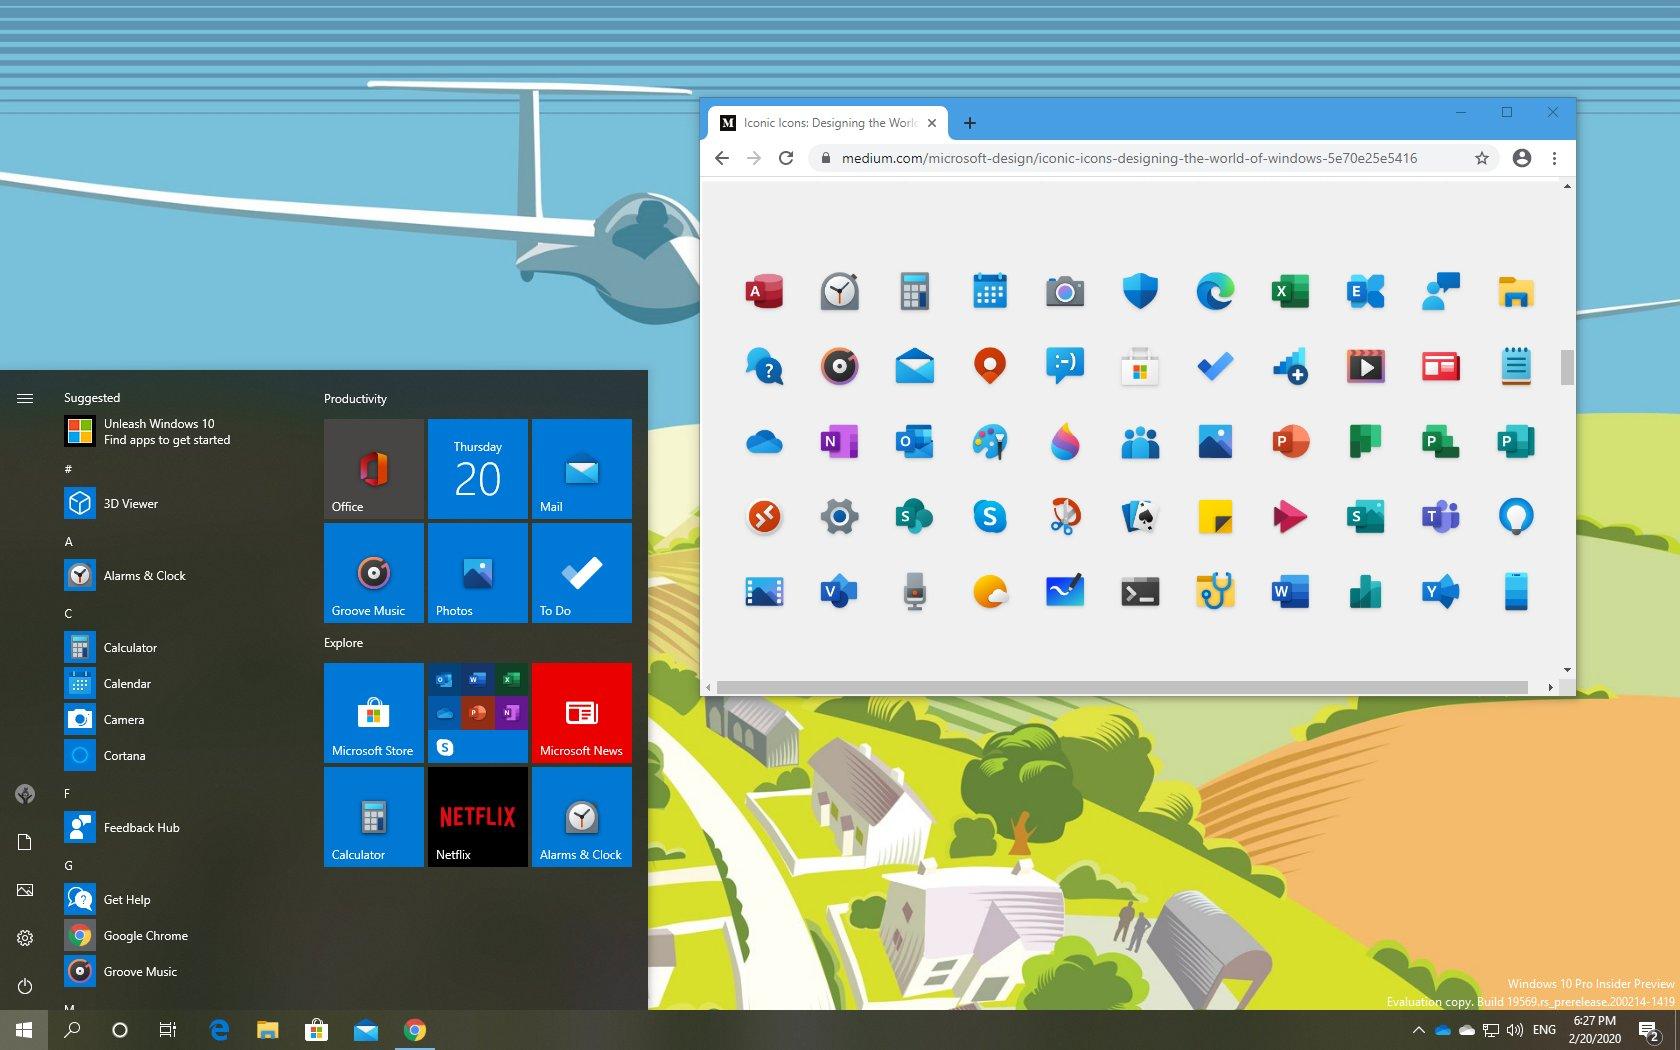 Windows 10 new modern icons